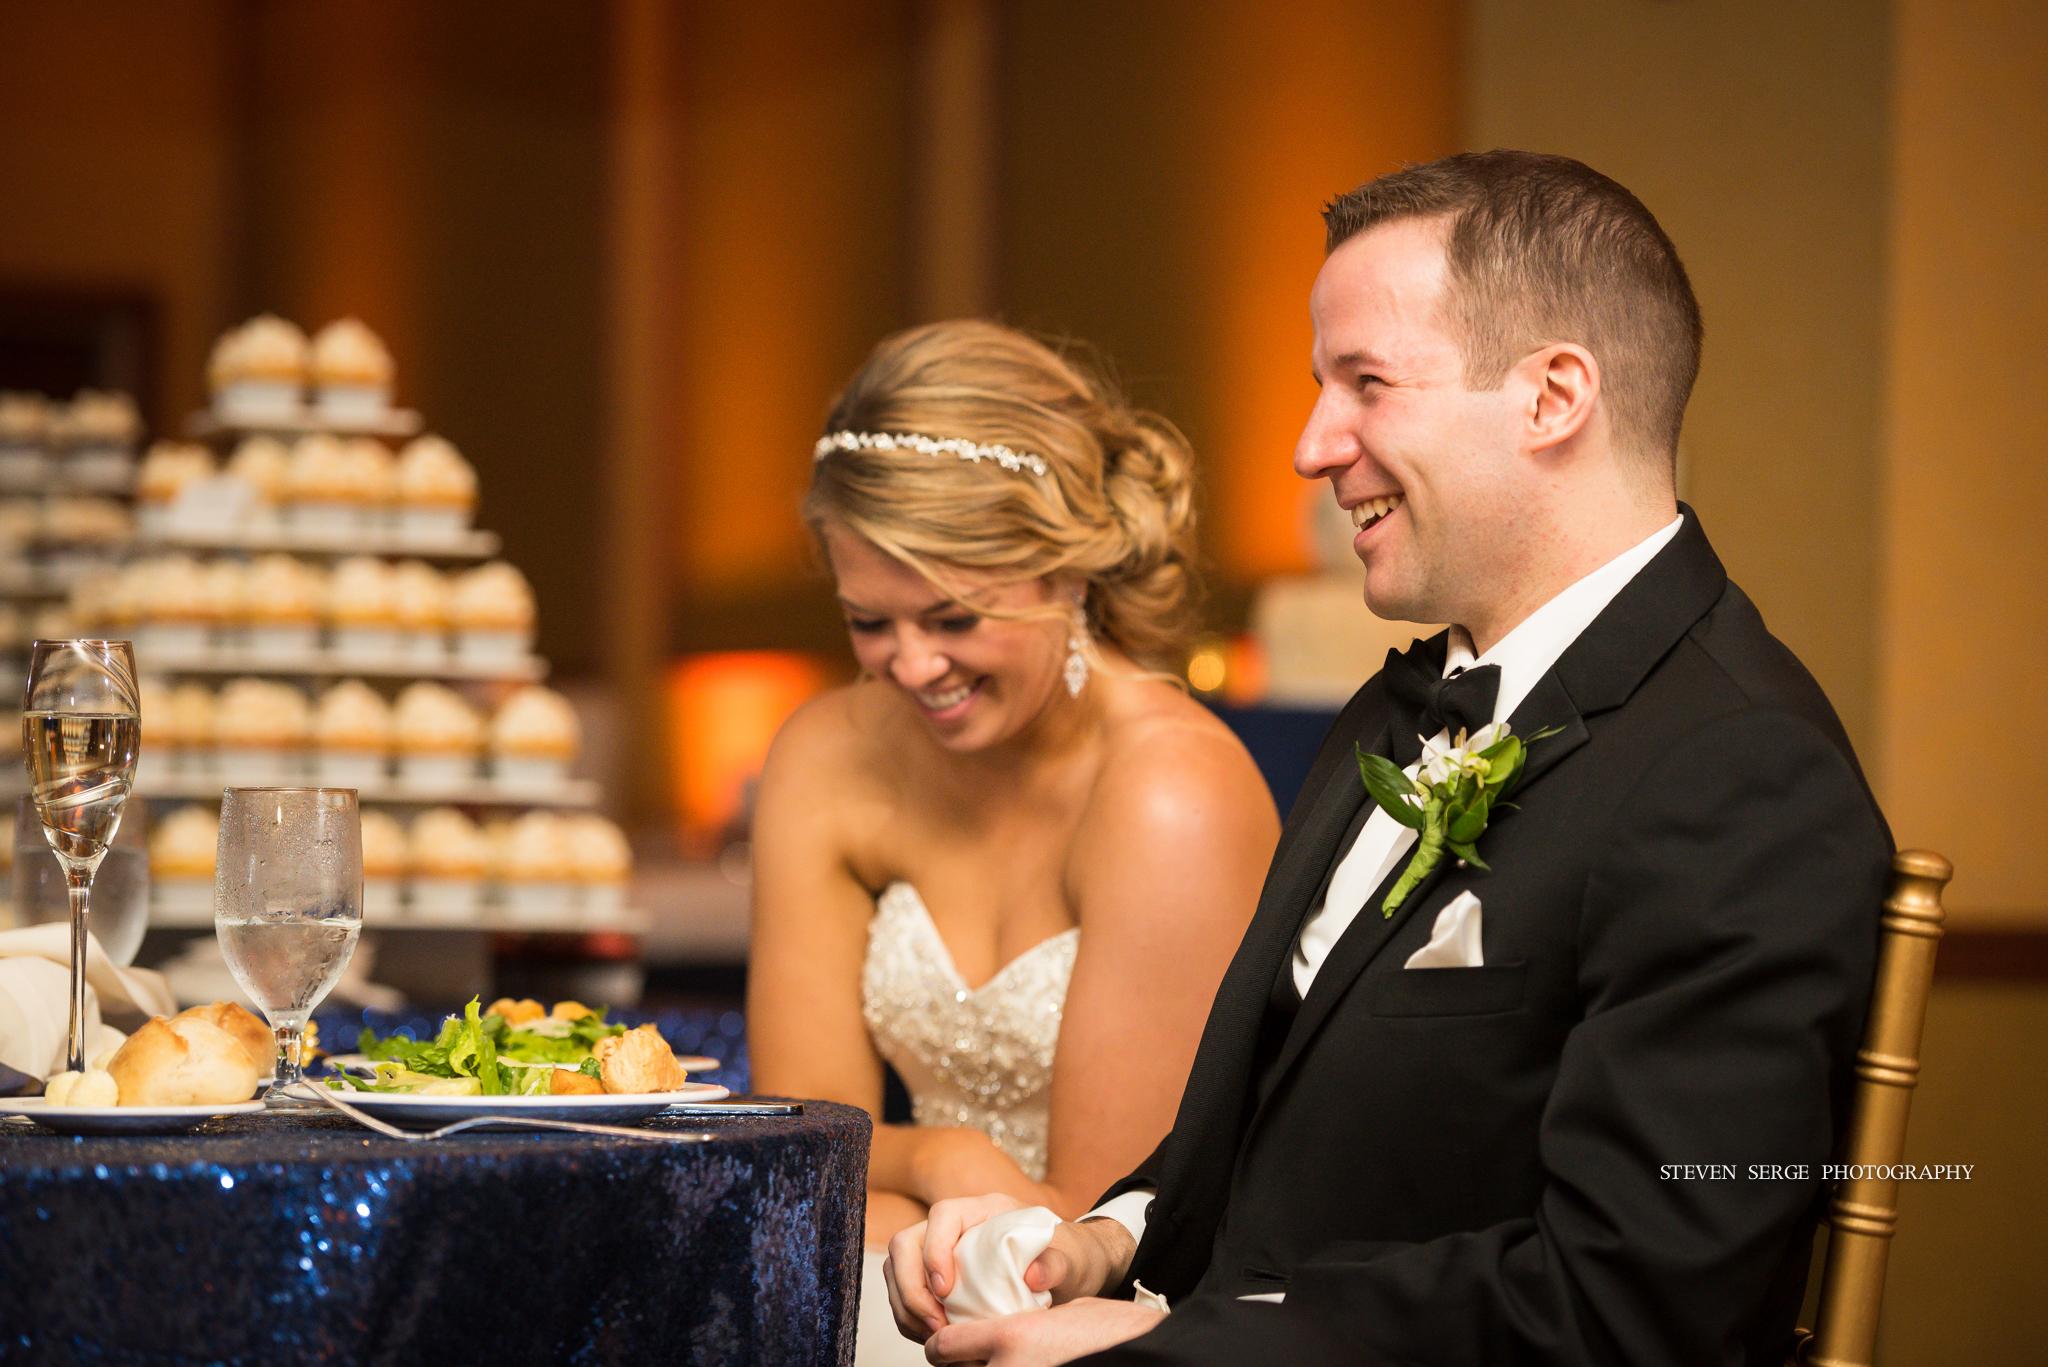 scranton-wedding-photographers-hilton-steven-serge-photography-21.jpg